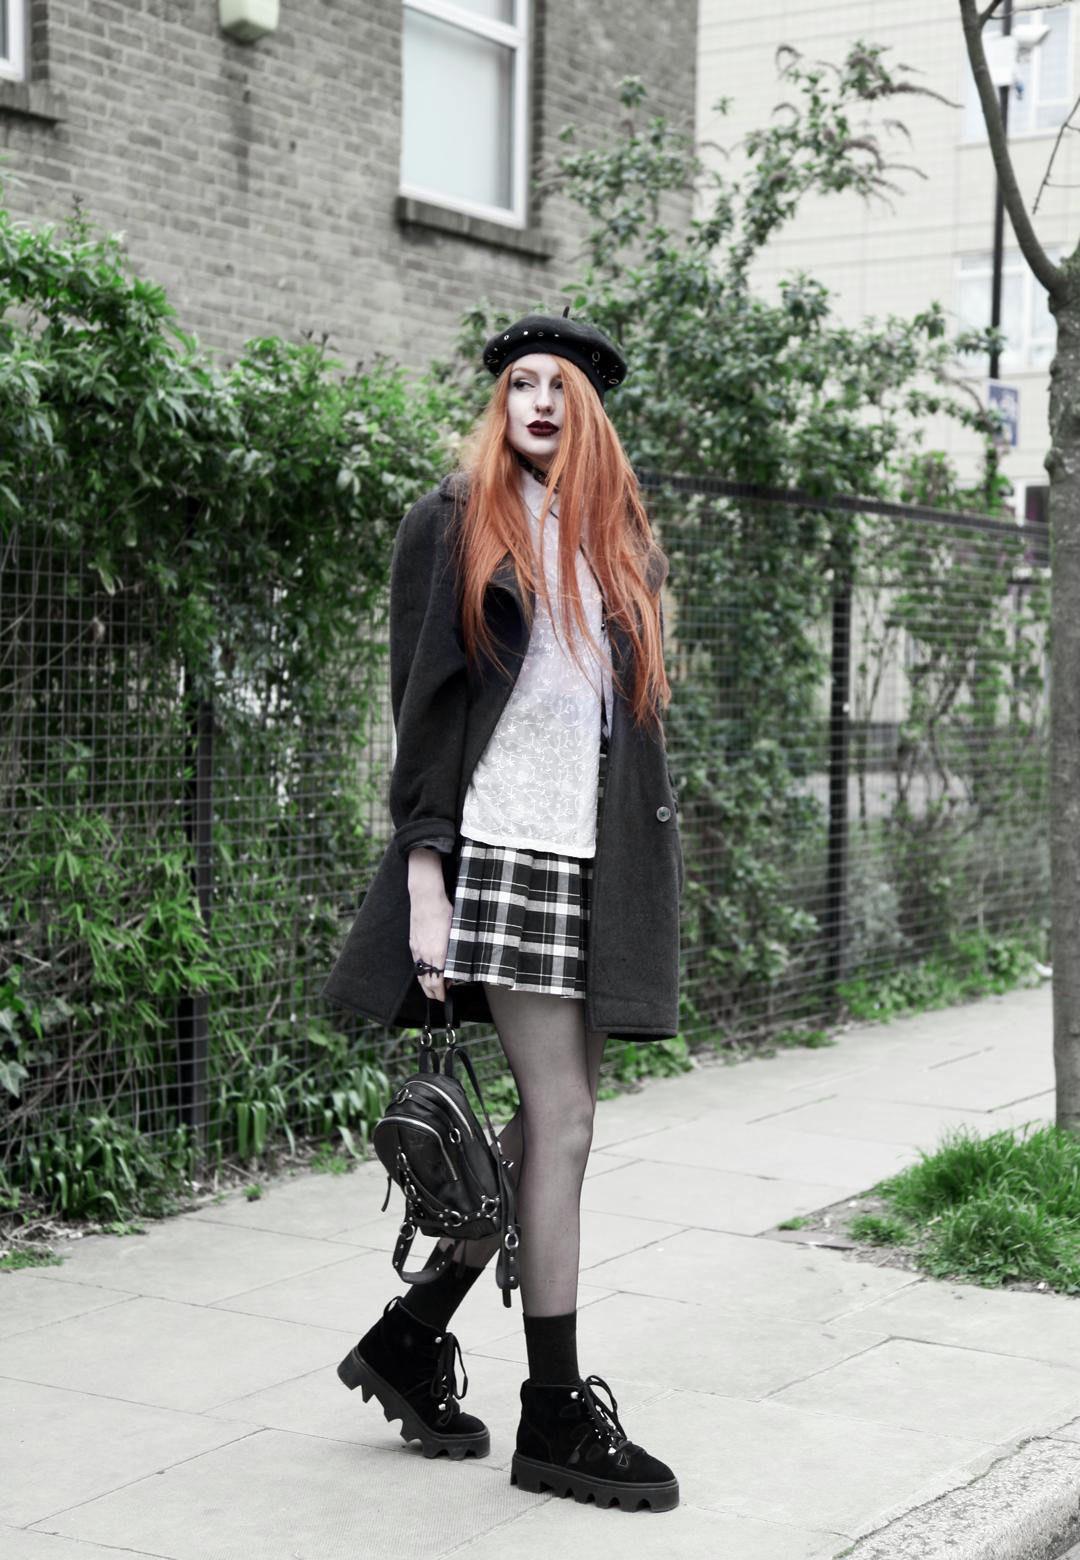 Olivia Emily wears Asos Eyelet Beret, Seconhand Coat & Blouse, Asos x Le Kilt collab plaid skirt, unif bound mini backpack, Underground Jungle Evolution Boots